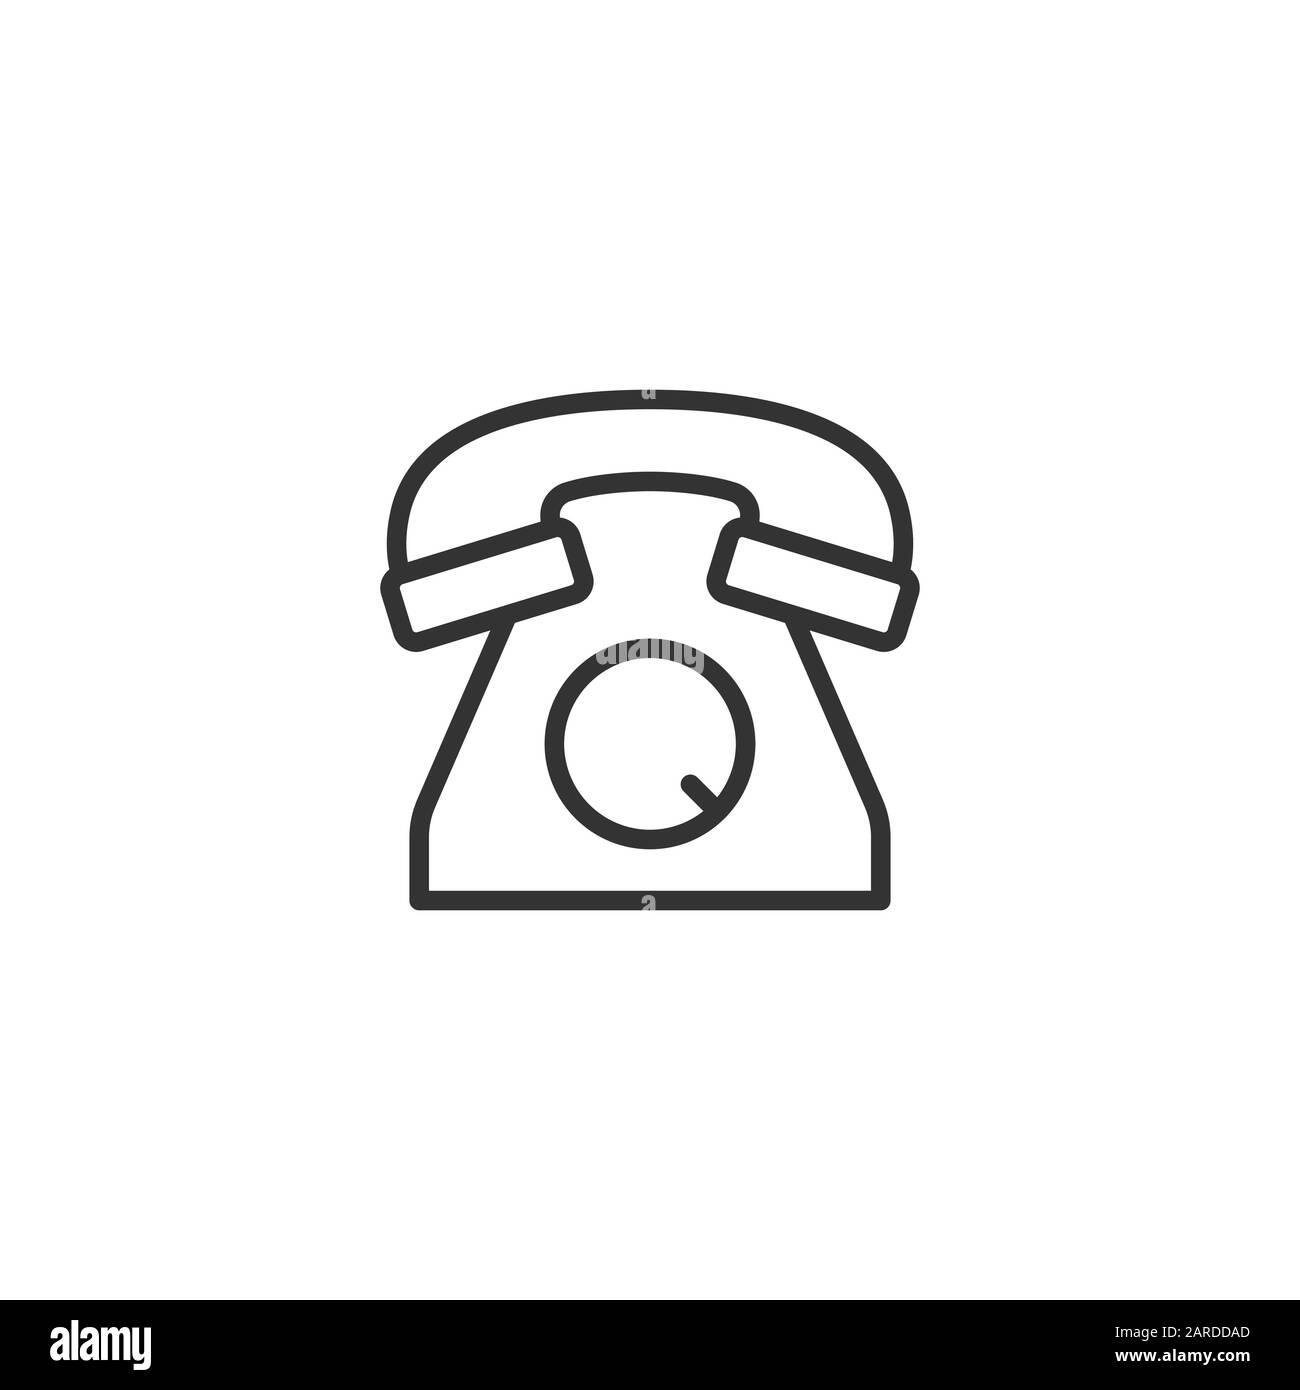 Telephone Talk On The Phone